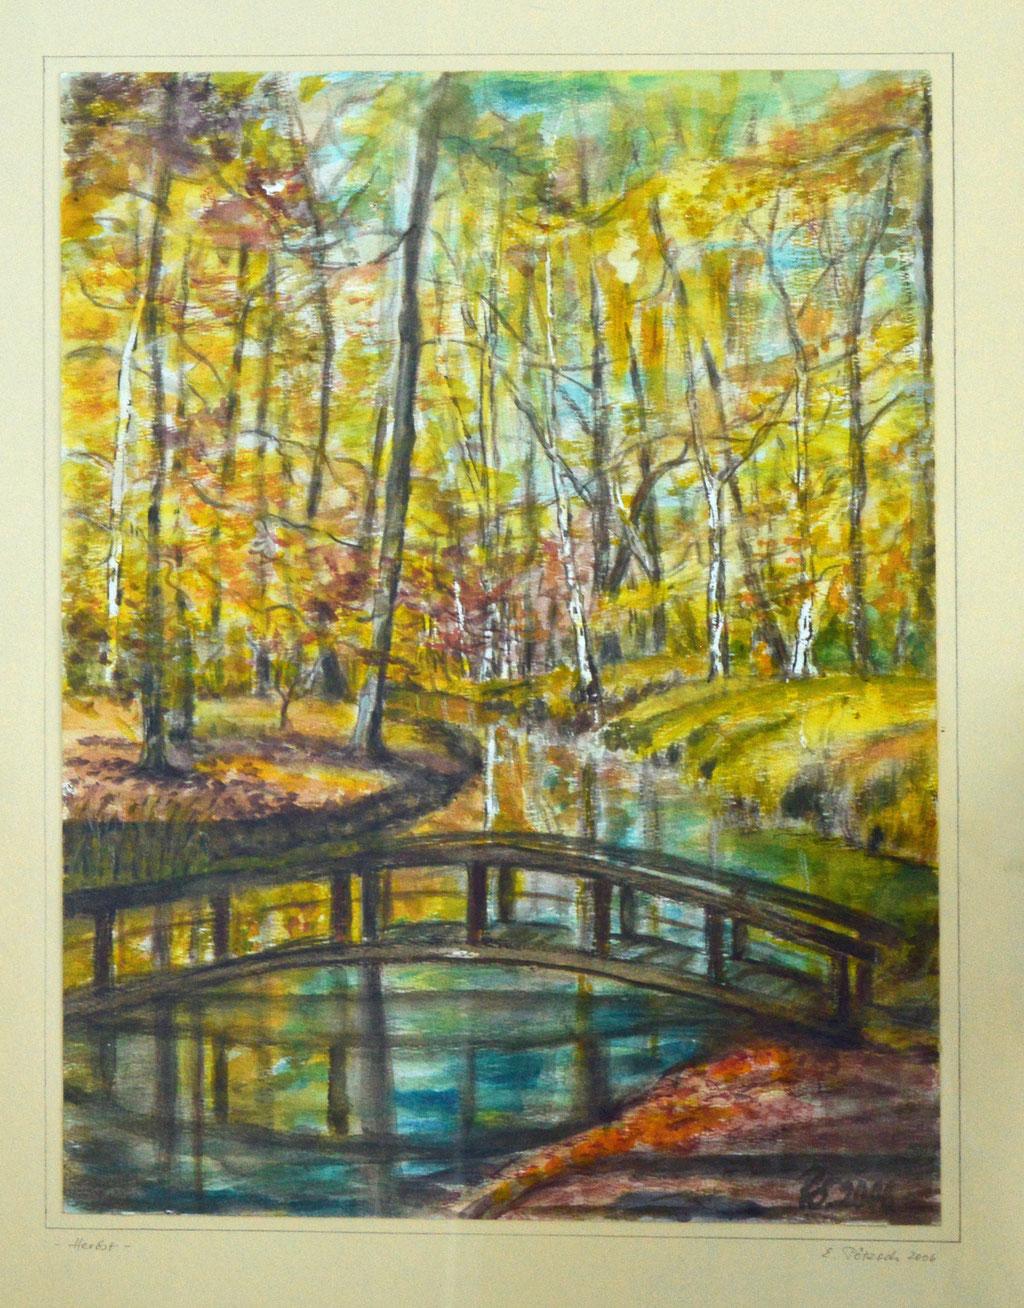 Herbst I-Aquarell 2017-30x40 cm-70 €